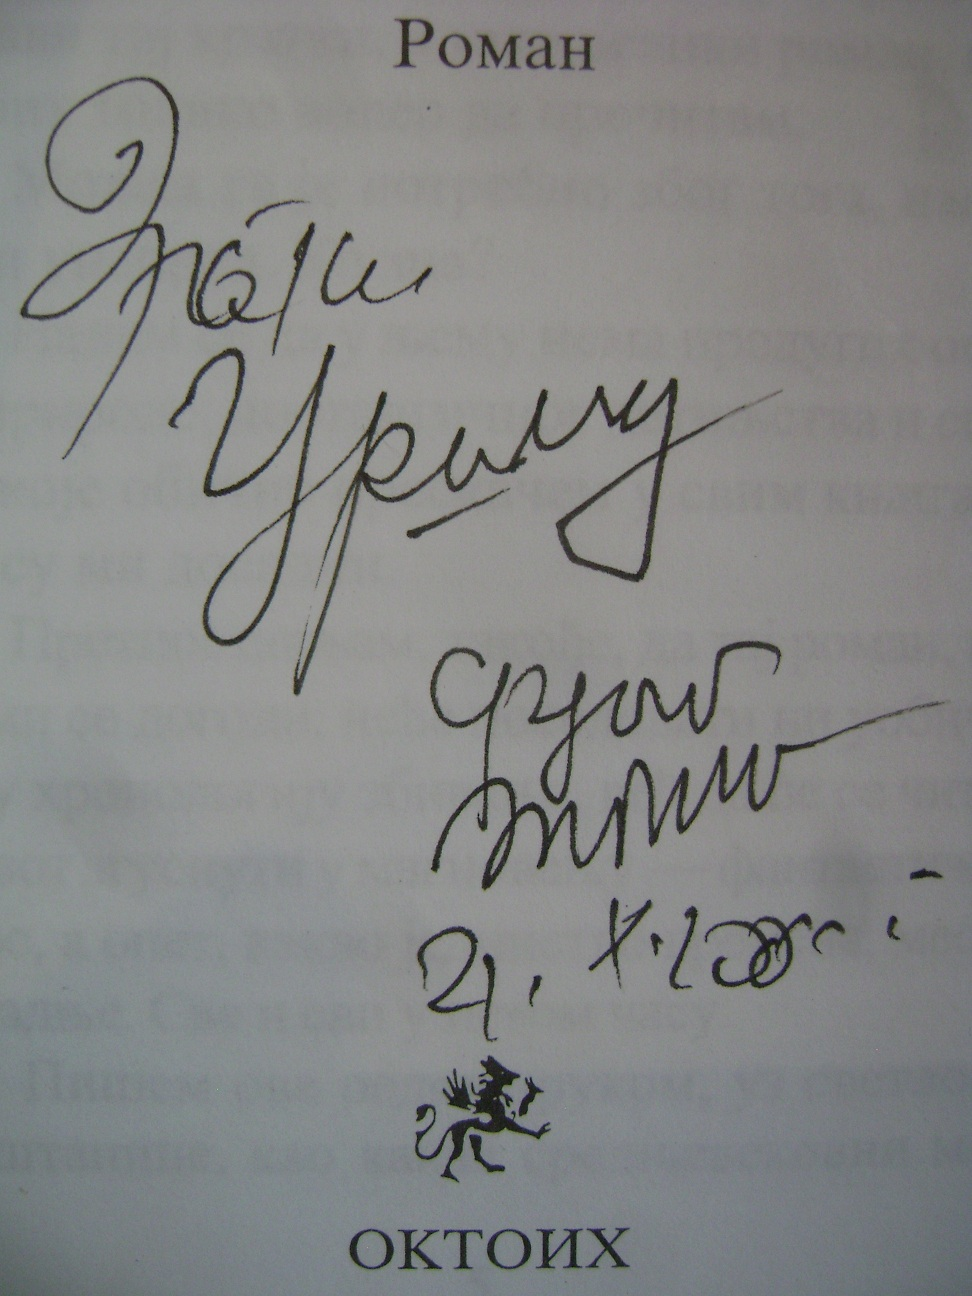 Autogram_Momo_Kapor__1.JPG